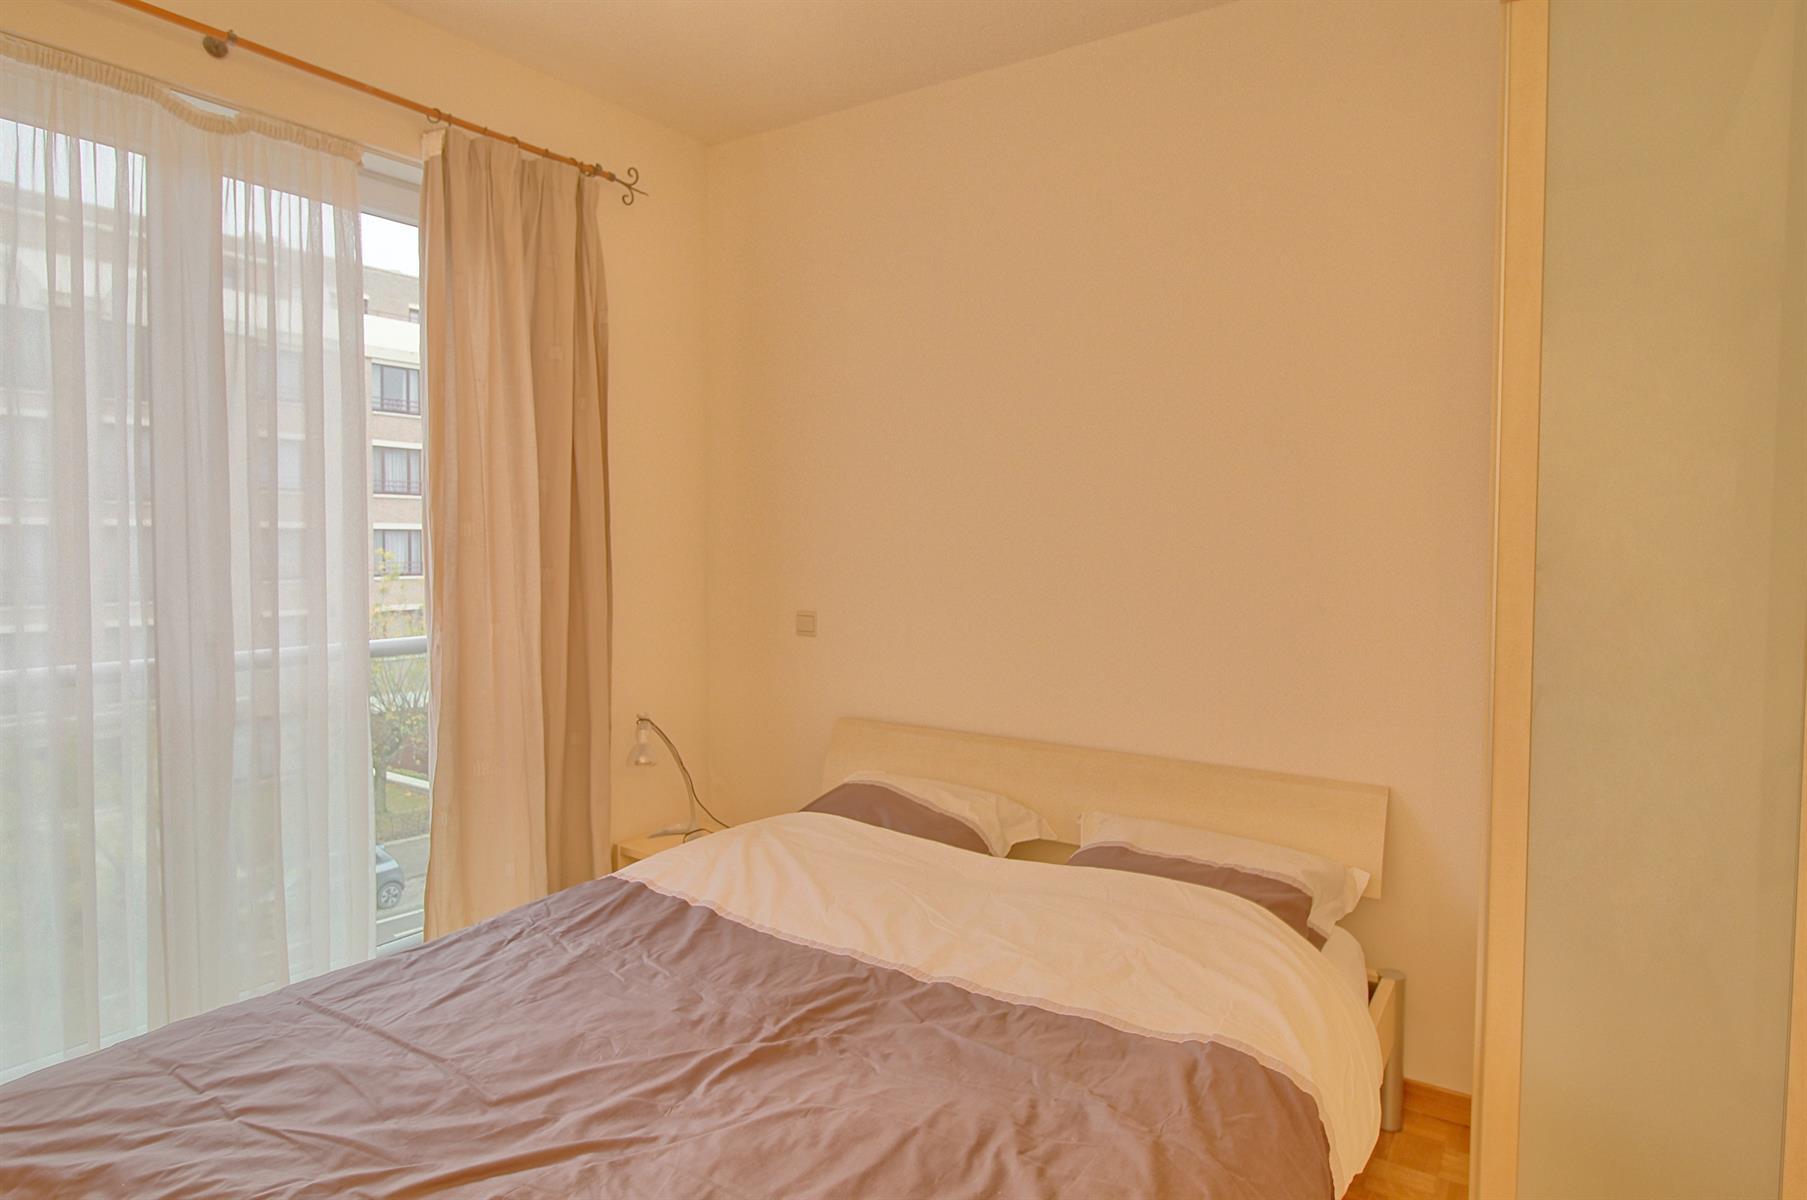 Appartement - Woluwe-Saint-Lambert - #4208881-2